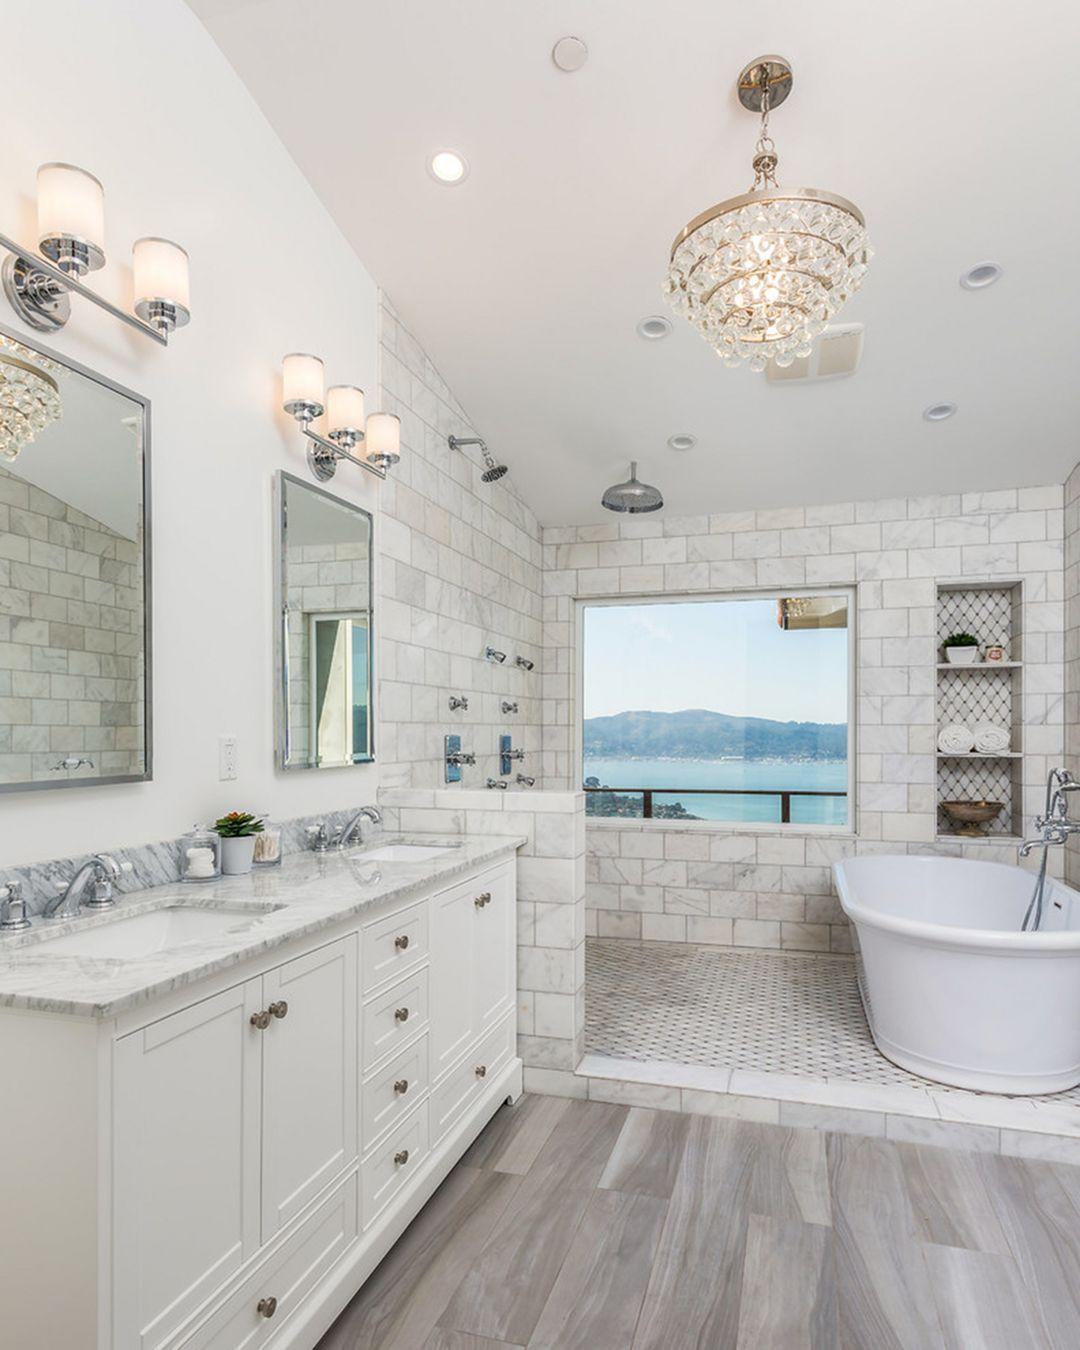 Best Farmhouse Bathroom Design Bathroom Farmhouse Style Bathroom Interior Design Bathroom Remodel Ideas Grey